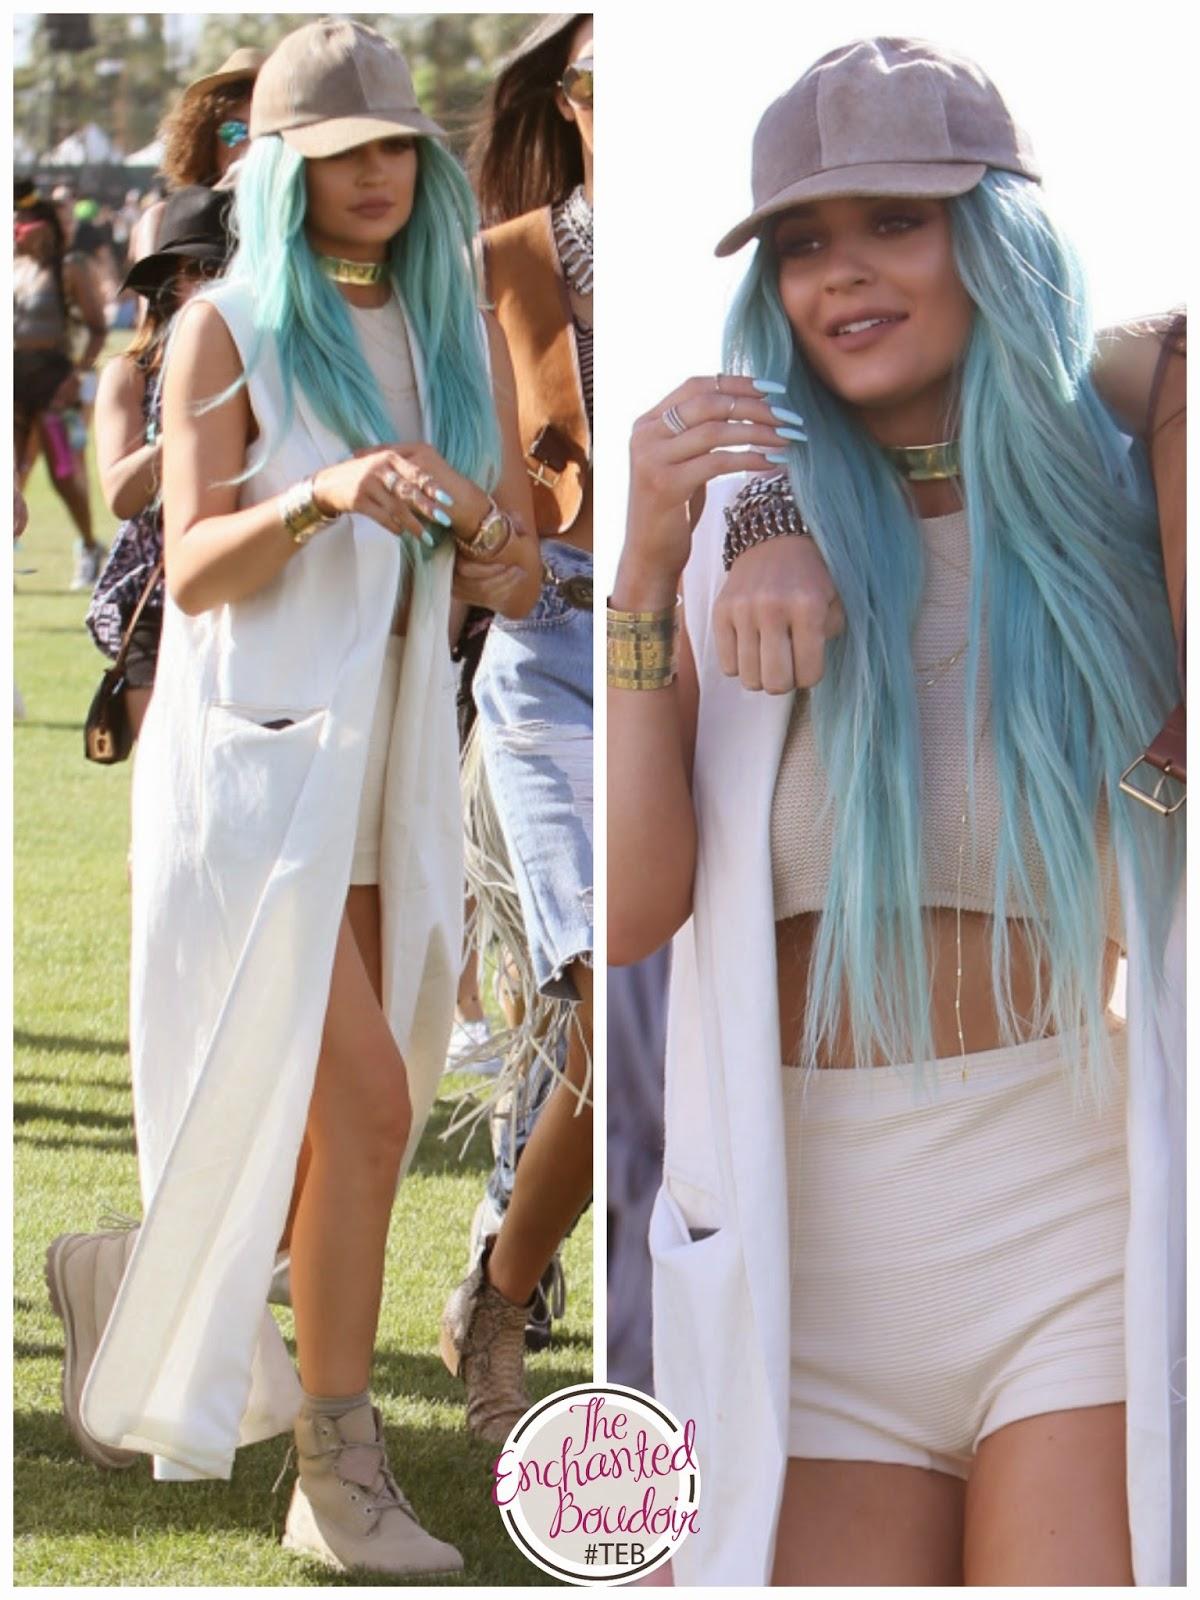 Kylie Jenner Coachella 2015